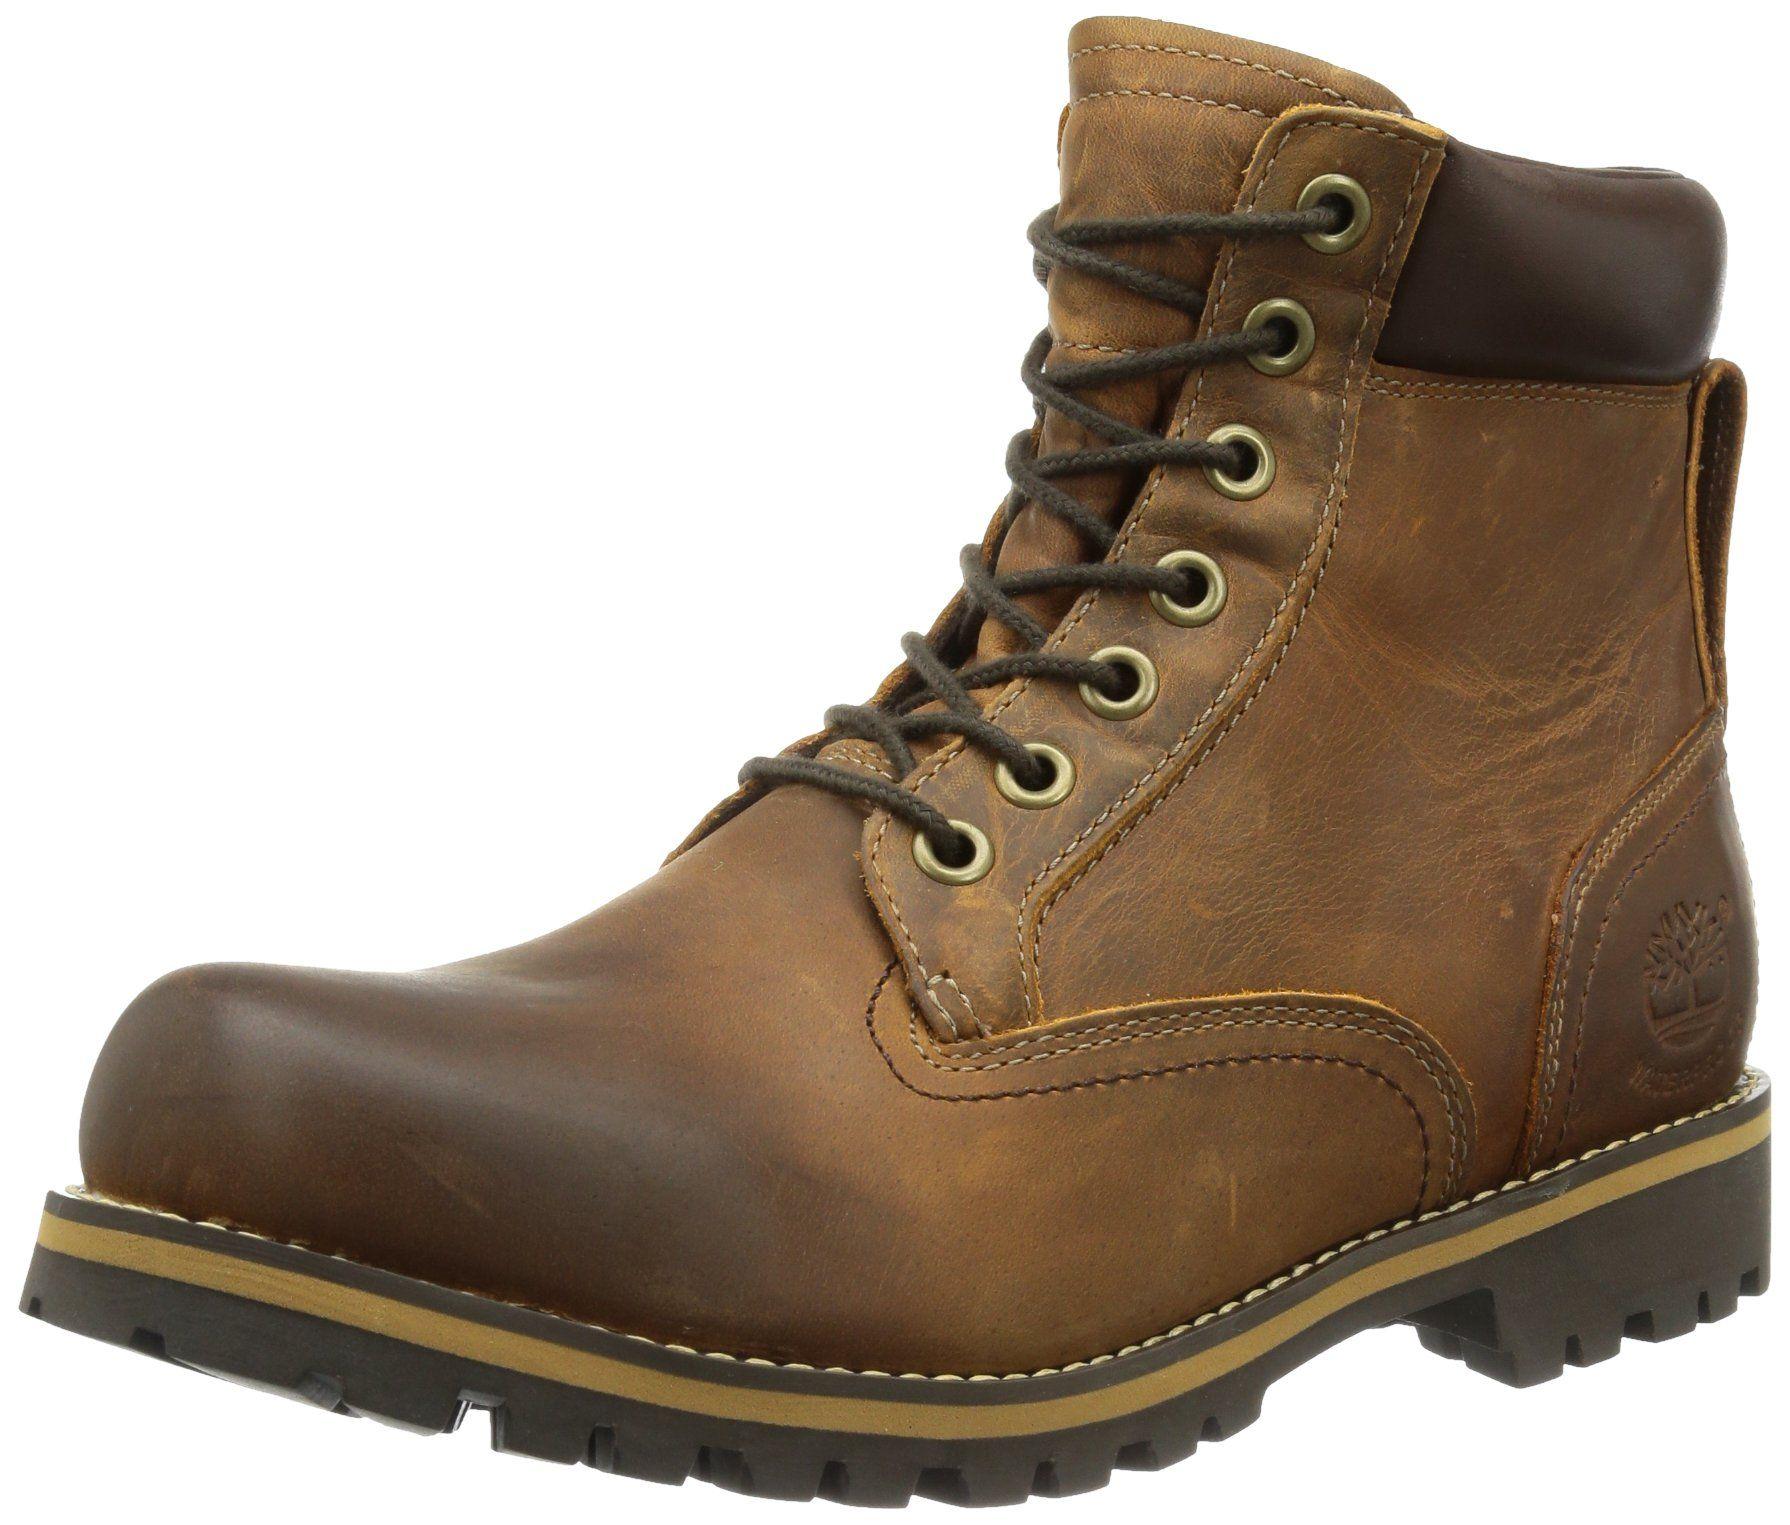 Timberland Earthkeepers Rugged Waterproof 6in Plain Toe Boot Men's